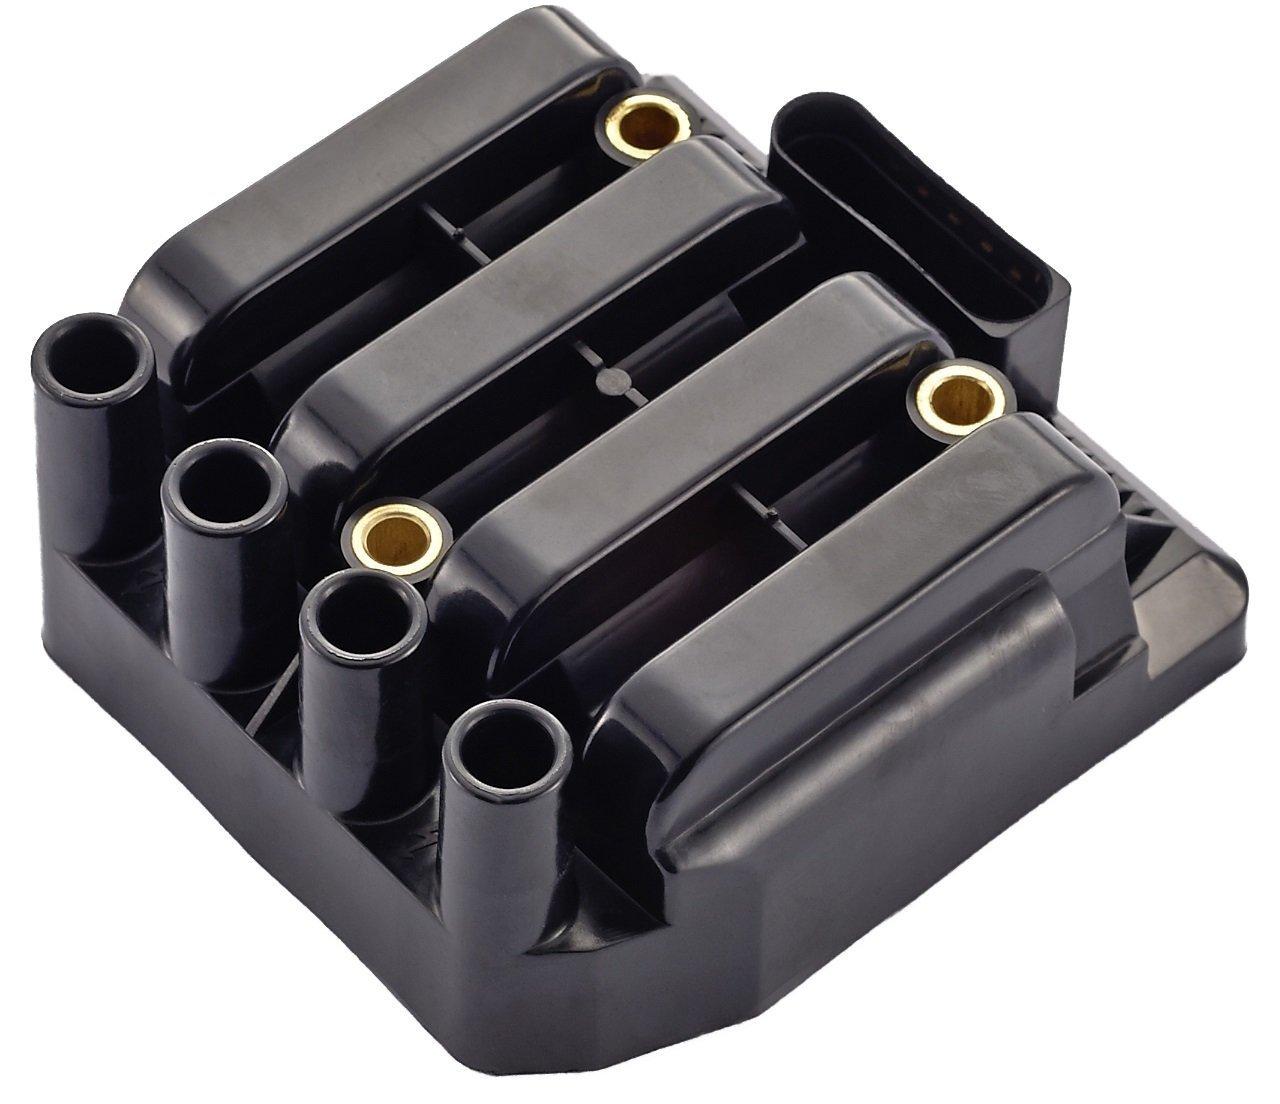 Ignition Coil Pack For Volkswagen Vw Beetle Golf Jetta 66 Engine Diagram Clasico 20l L4 Fit Uf484 C1393 5c1390 Automotive